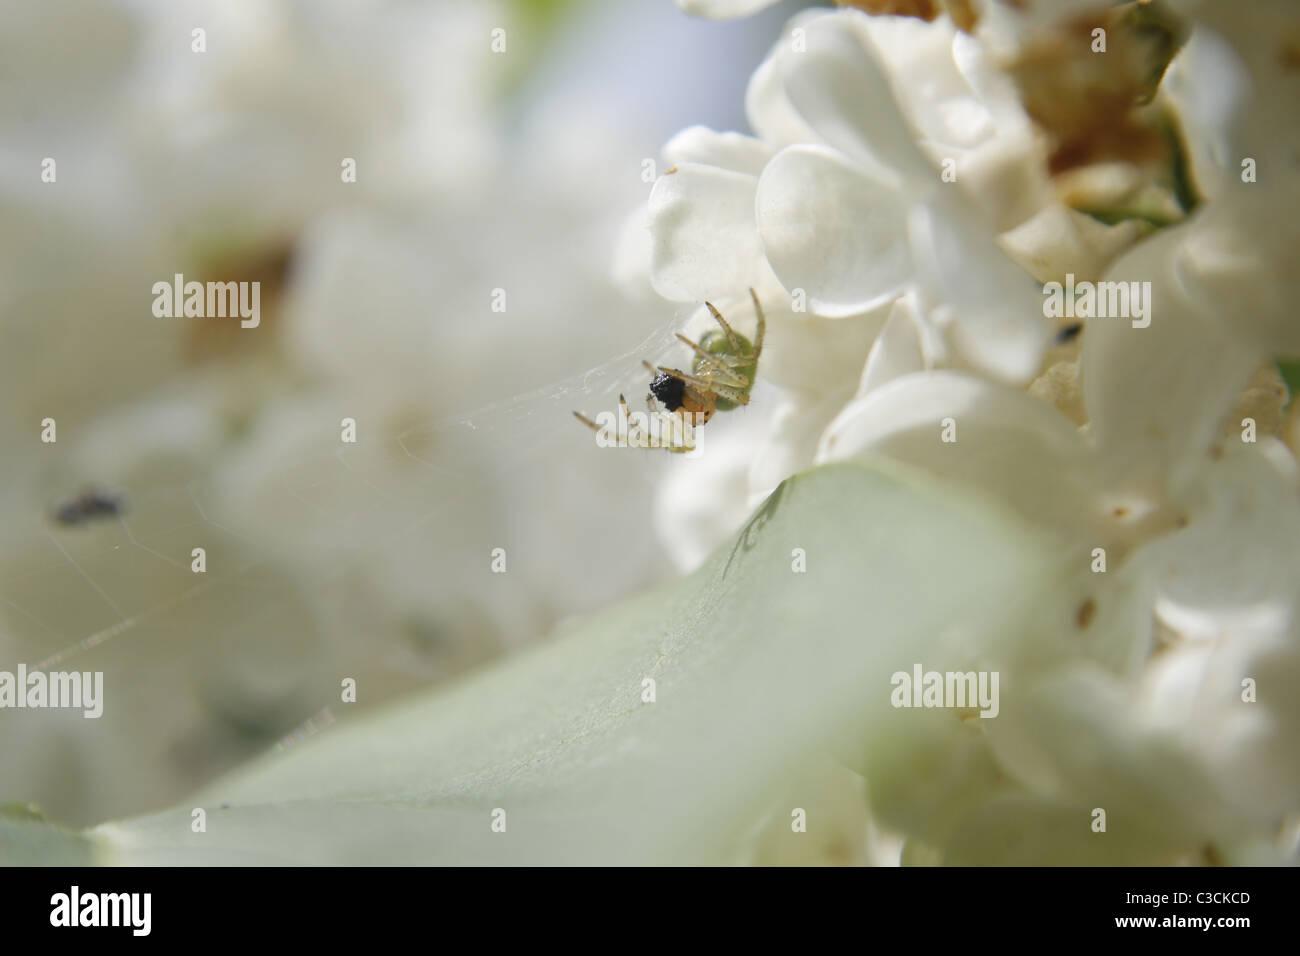 spider eating prey among white lilac flowers Araniella curcurbitina - Stock Image